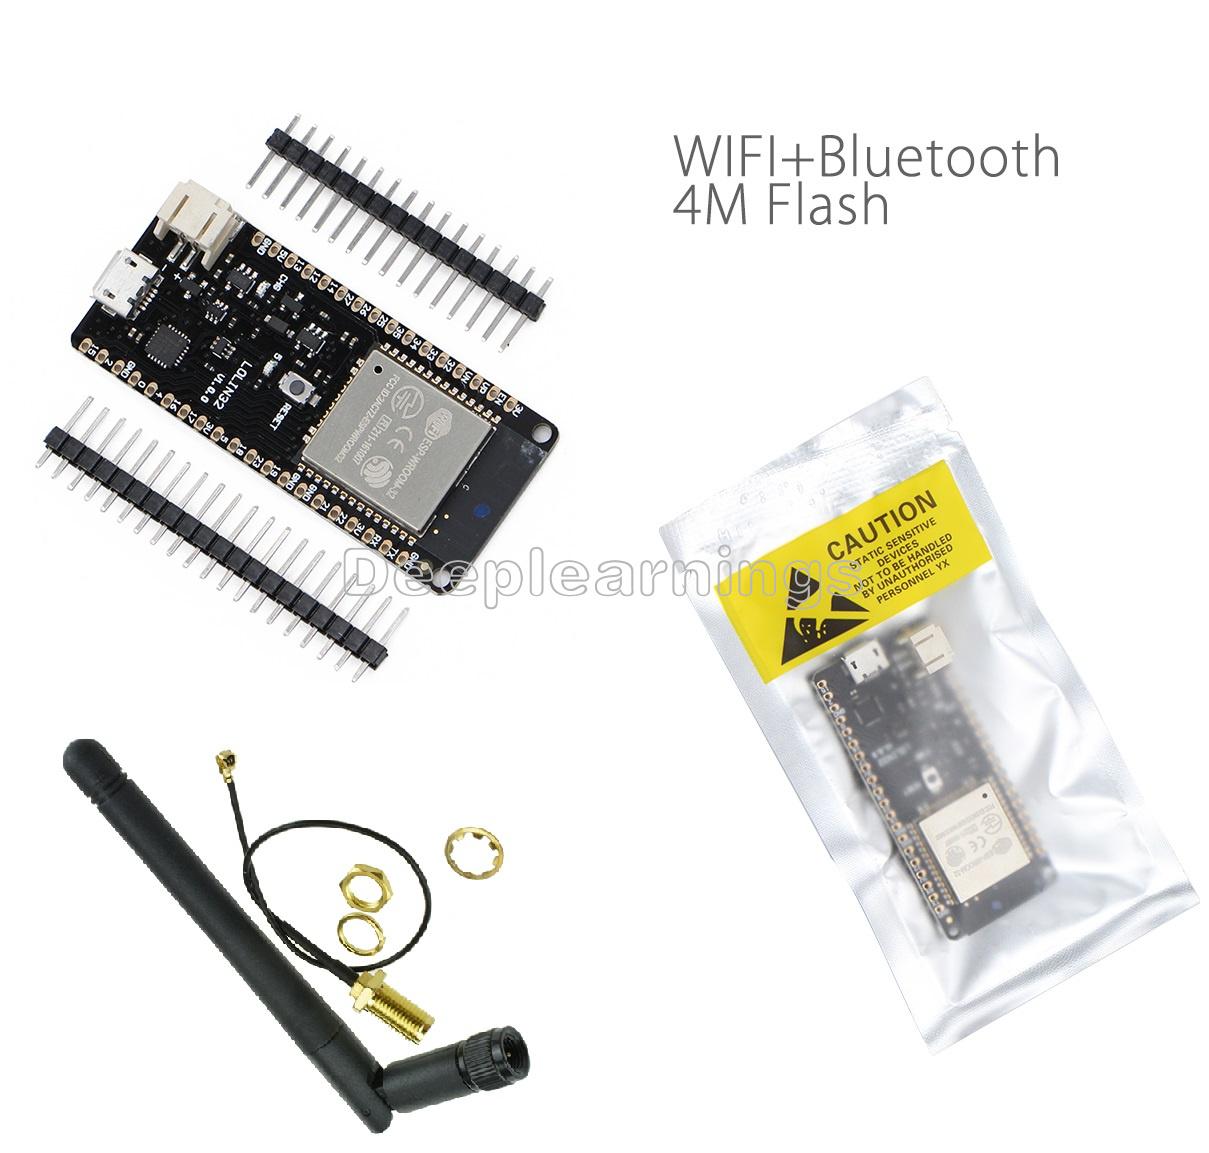 Details about 4 MB Flash WEMOS Lolin32 CP2104 WIFI & Bluetooth Card Based  ESP-32 ESP-WROOM-32